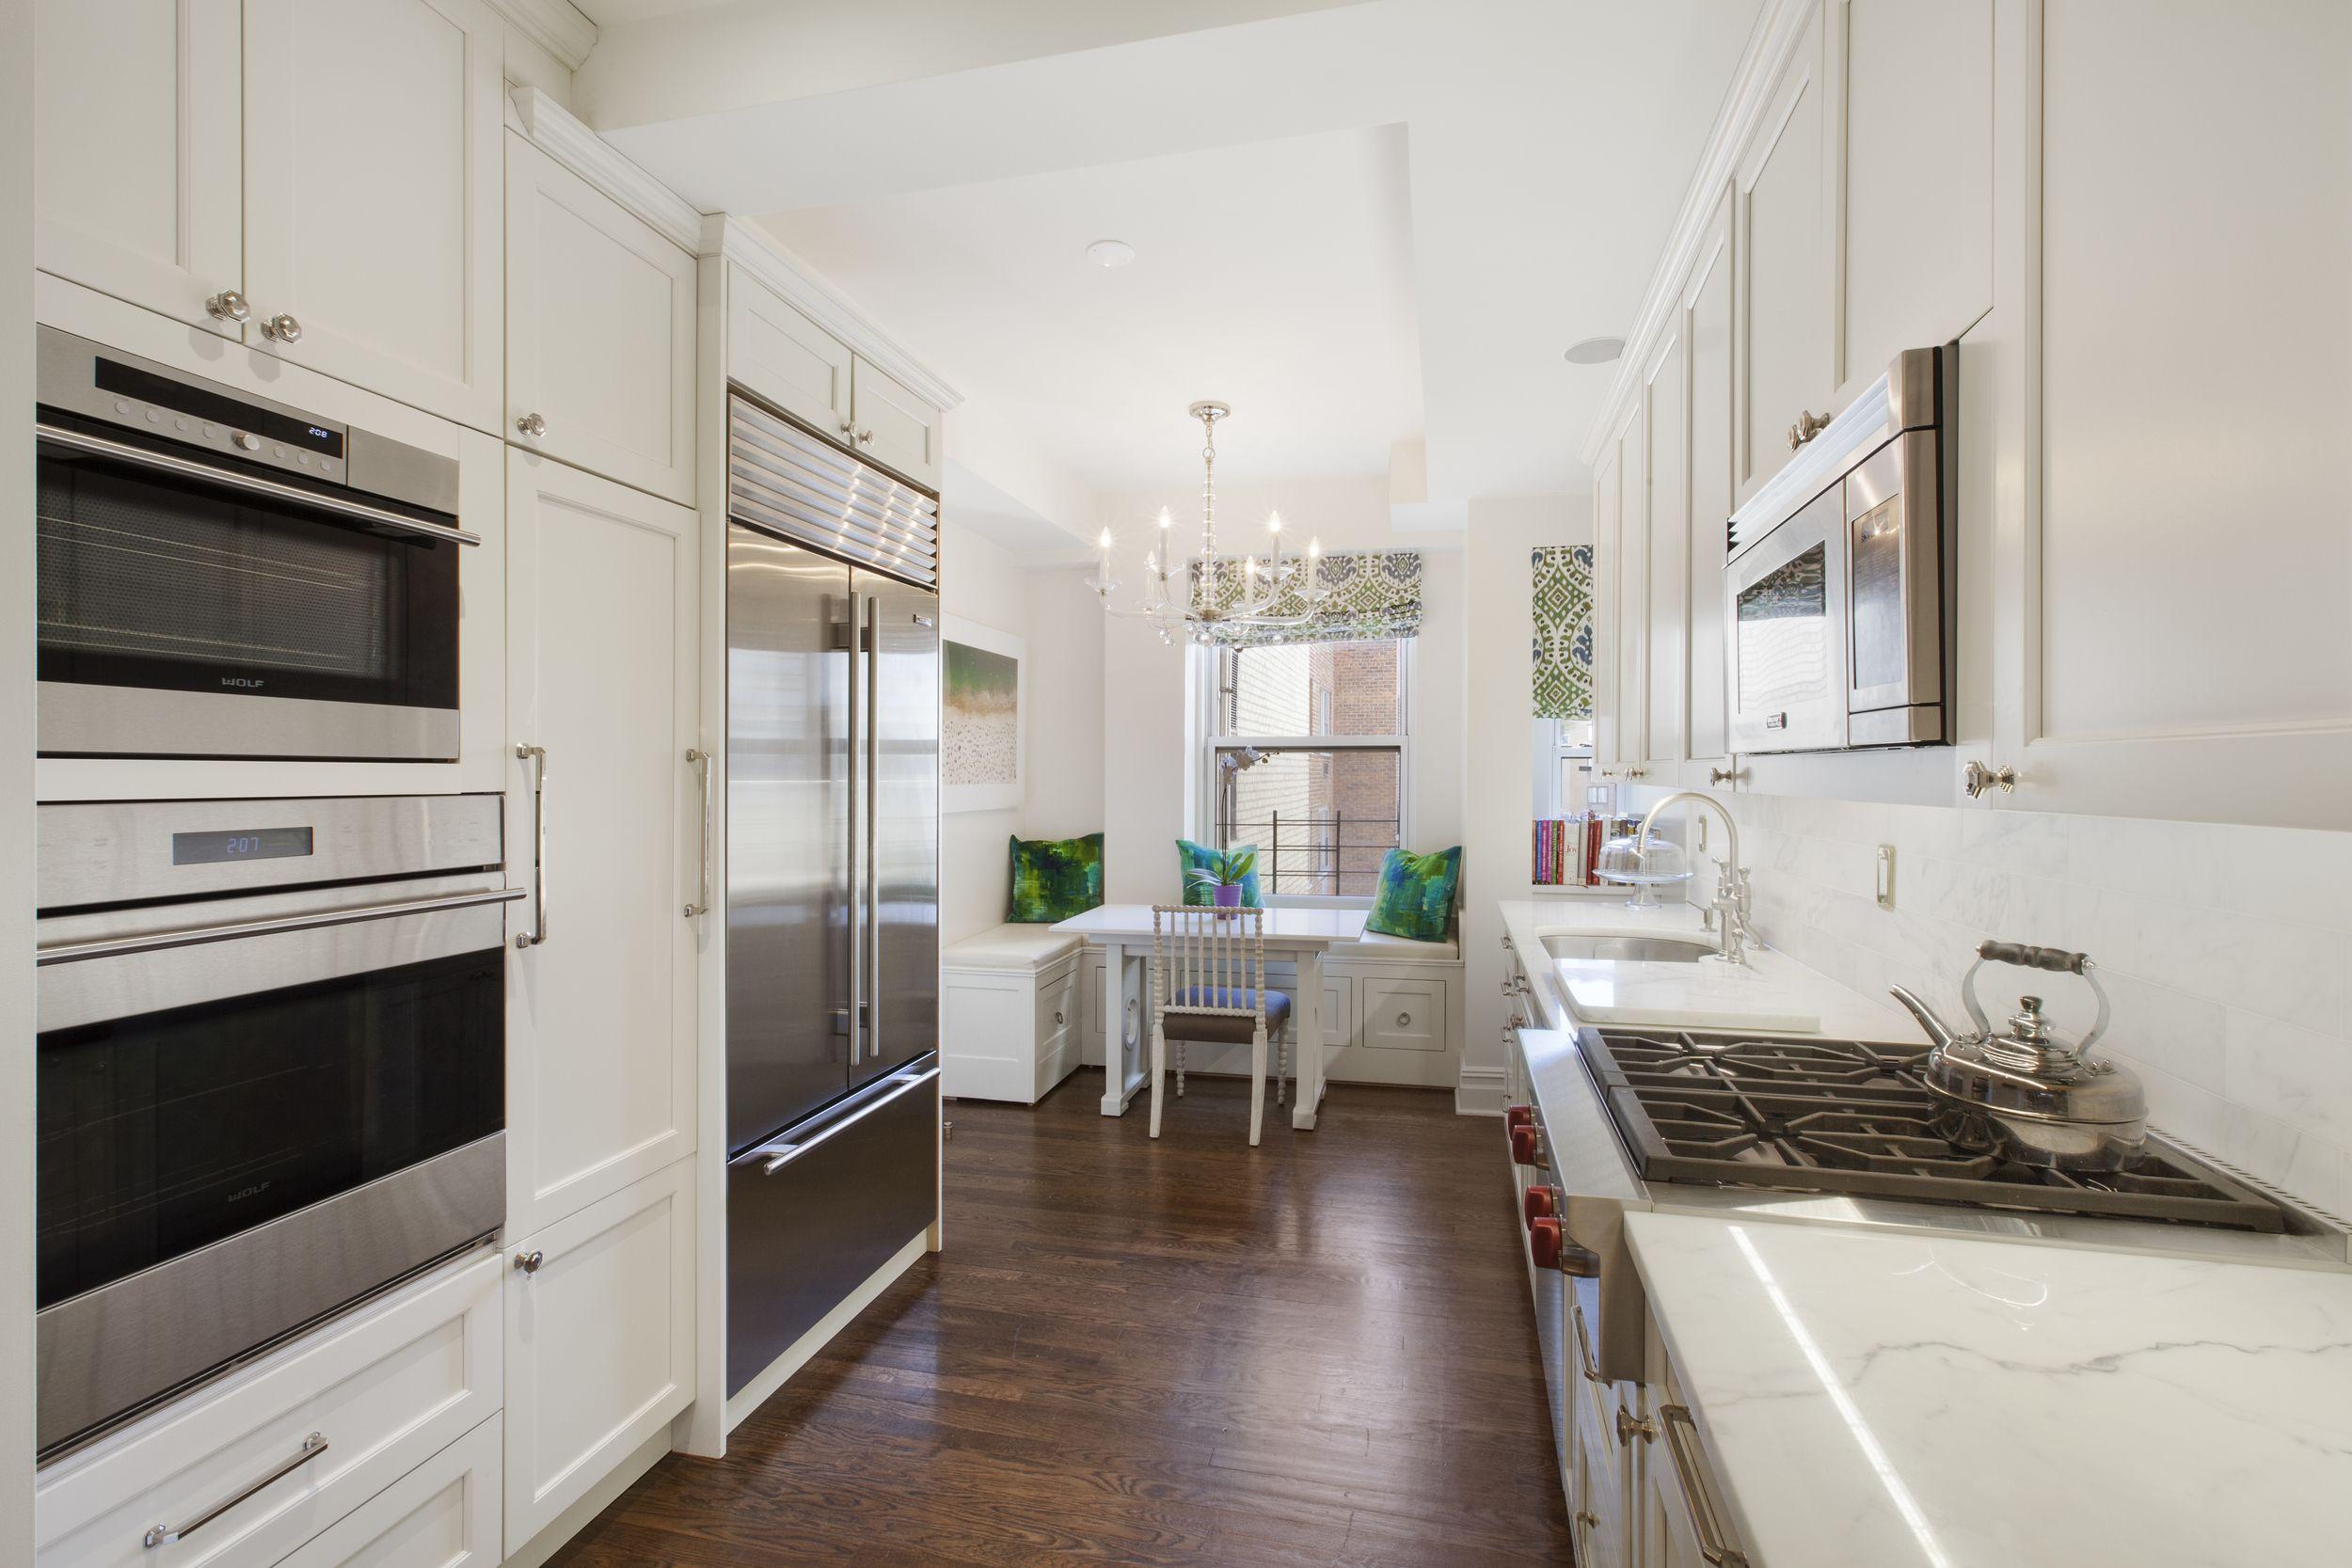 Maximum Use In Minimum Space Designer Jennifer Estes Skillfully Created A Full Service Kitchen In Kitchen Decor Inspiration Kitchen Decor Modern Kitchen Decor